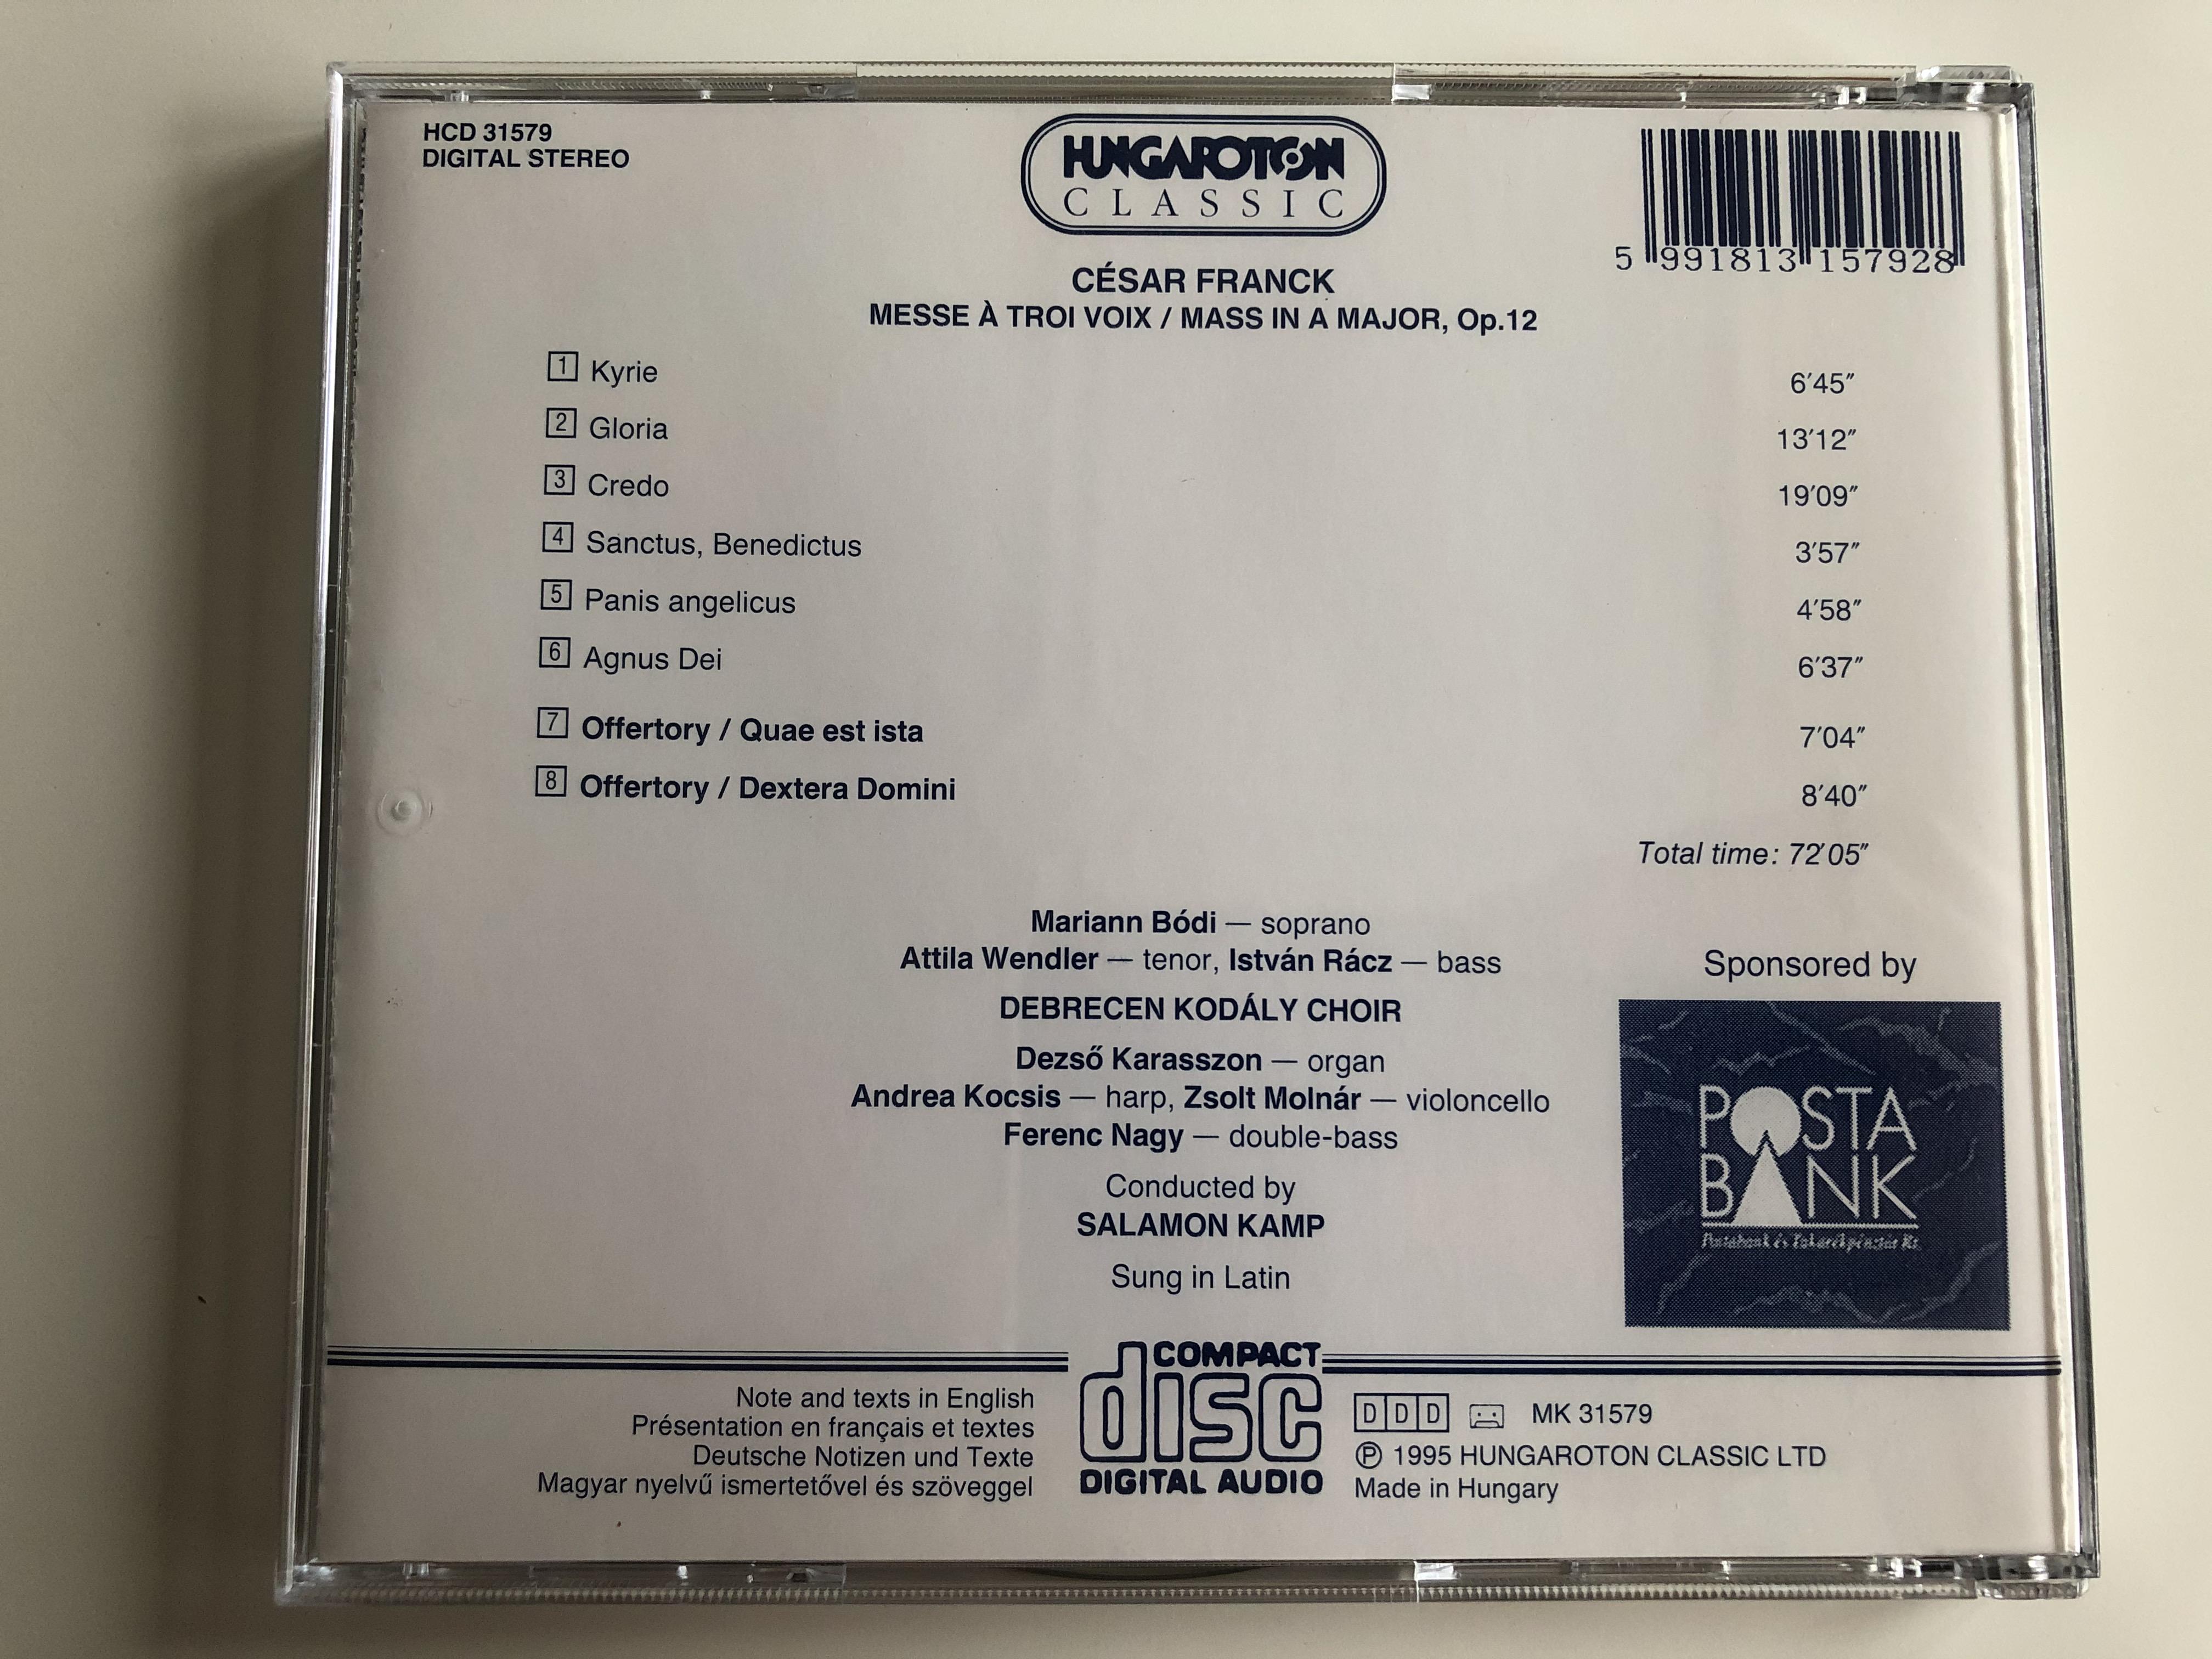 c-sar-franck-messe-a-troi-voix-quae-est-ista-dextera-domini-debrecen-kodaly-choir-dezso-karasszon-organ-salamon-kamp-hungaroton-classic-audio-cd-1995-stereo-hcd-31579-11-.jpg